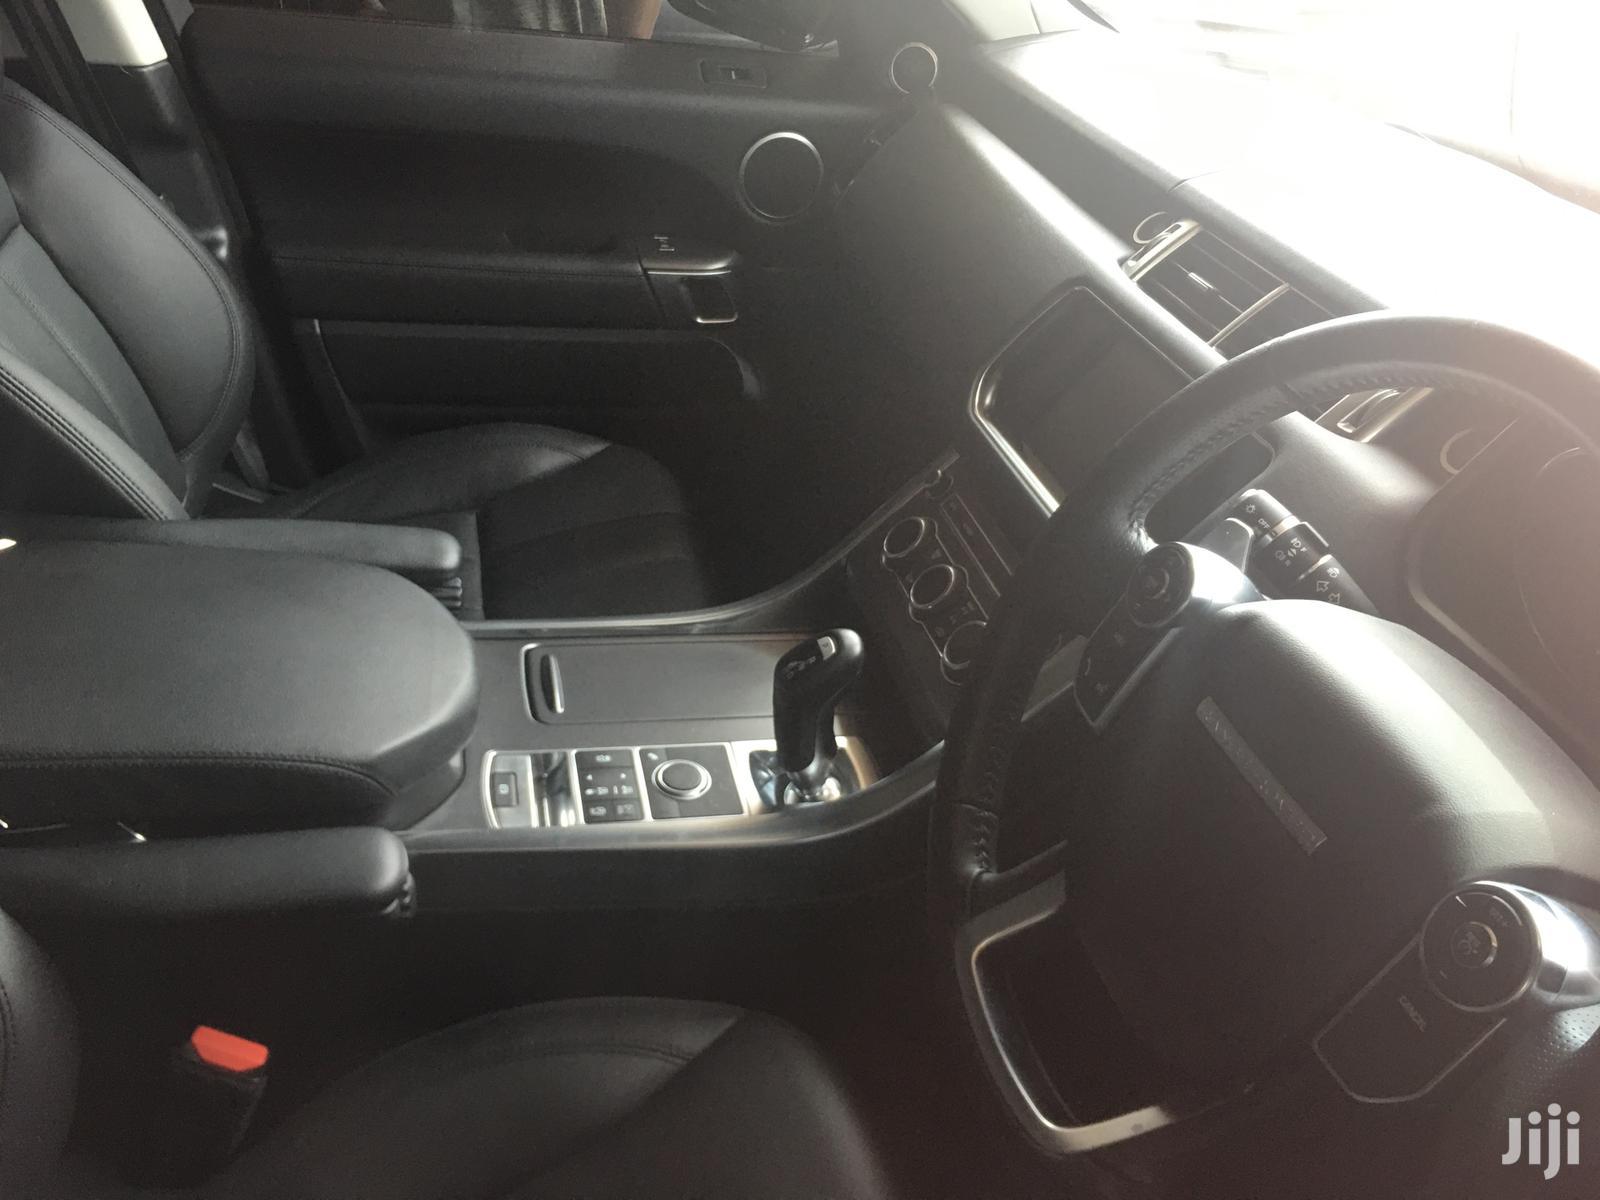 Land Rover Range Rover Sport 2017 Gray | Cars for sale in Kampala, Central Region, Uganda